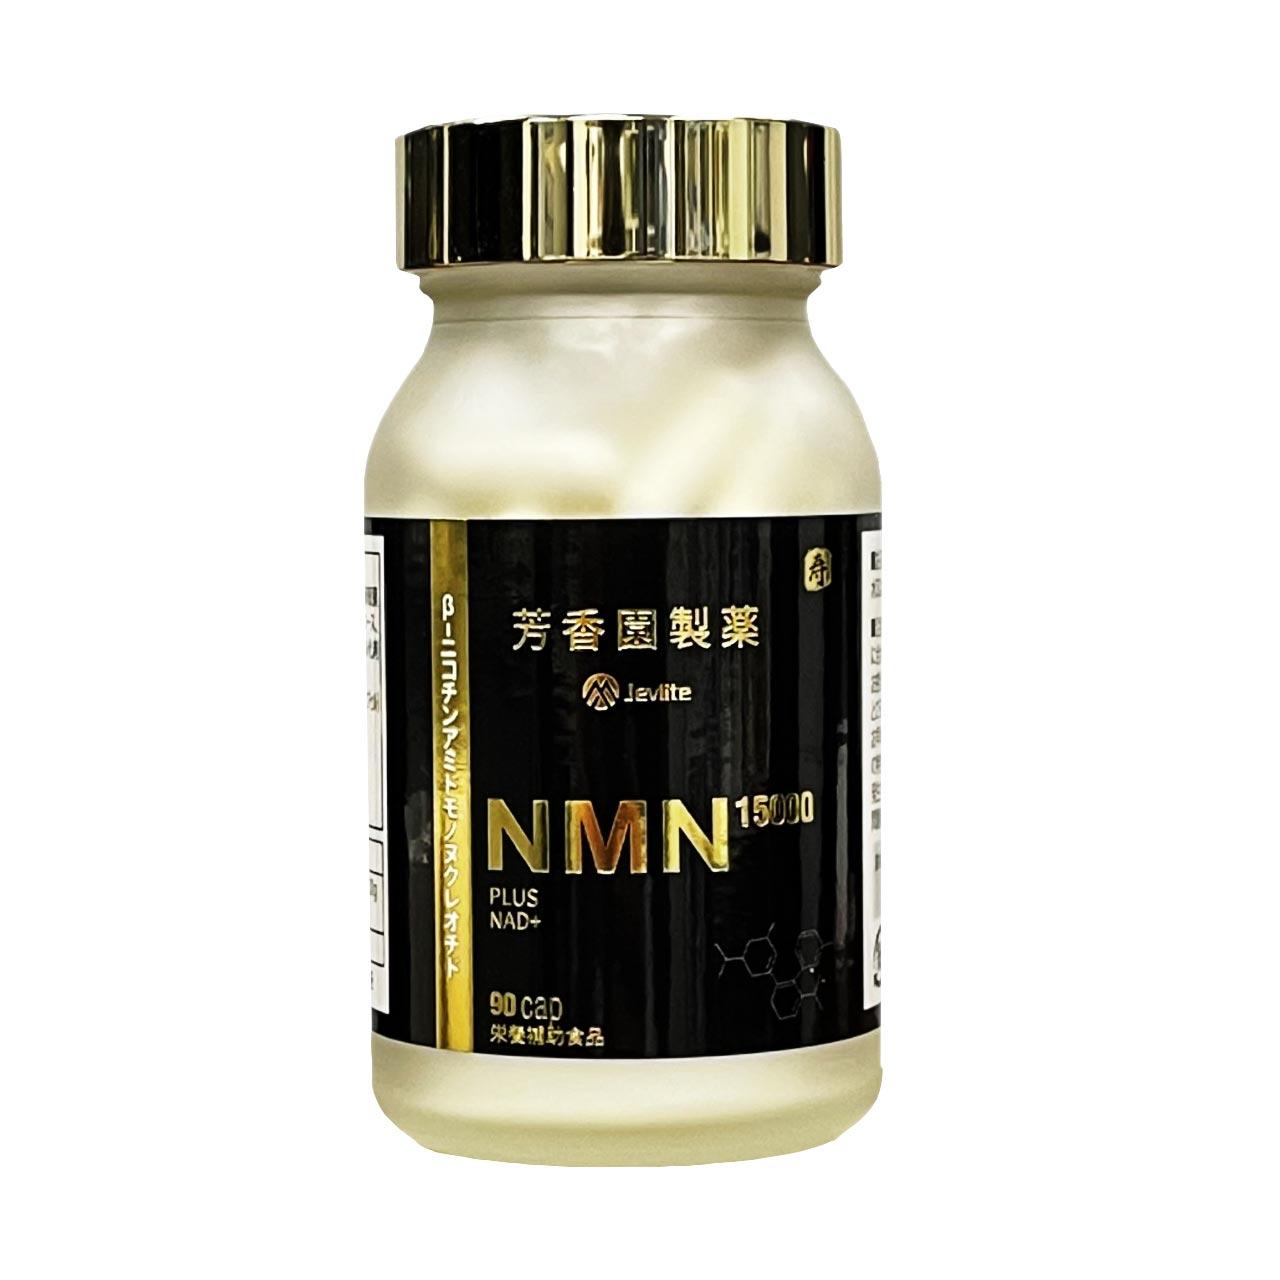 正規製薬会社出品・高純度酵母由来NMN使用・美白効果をヒト経口摂取で確認成分配合・全国送料無料 NMN15000 90CAP